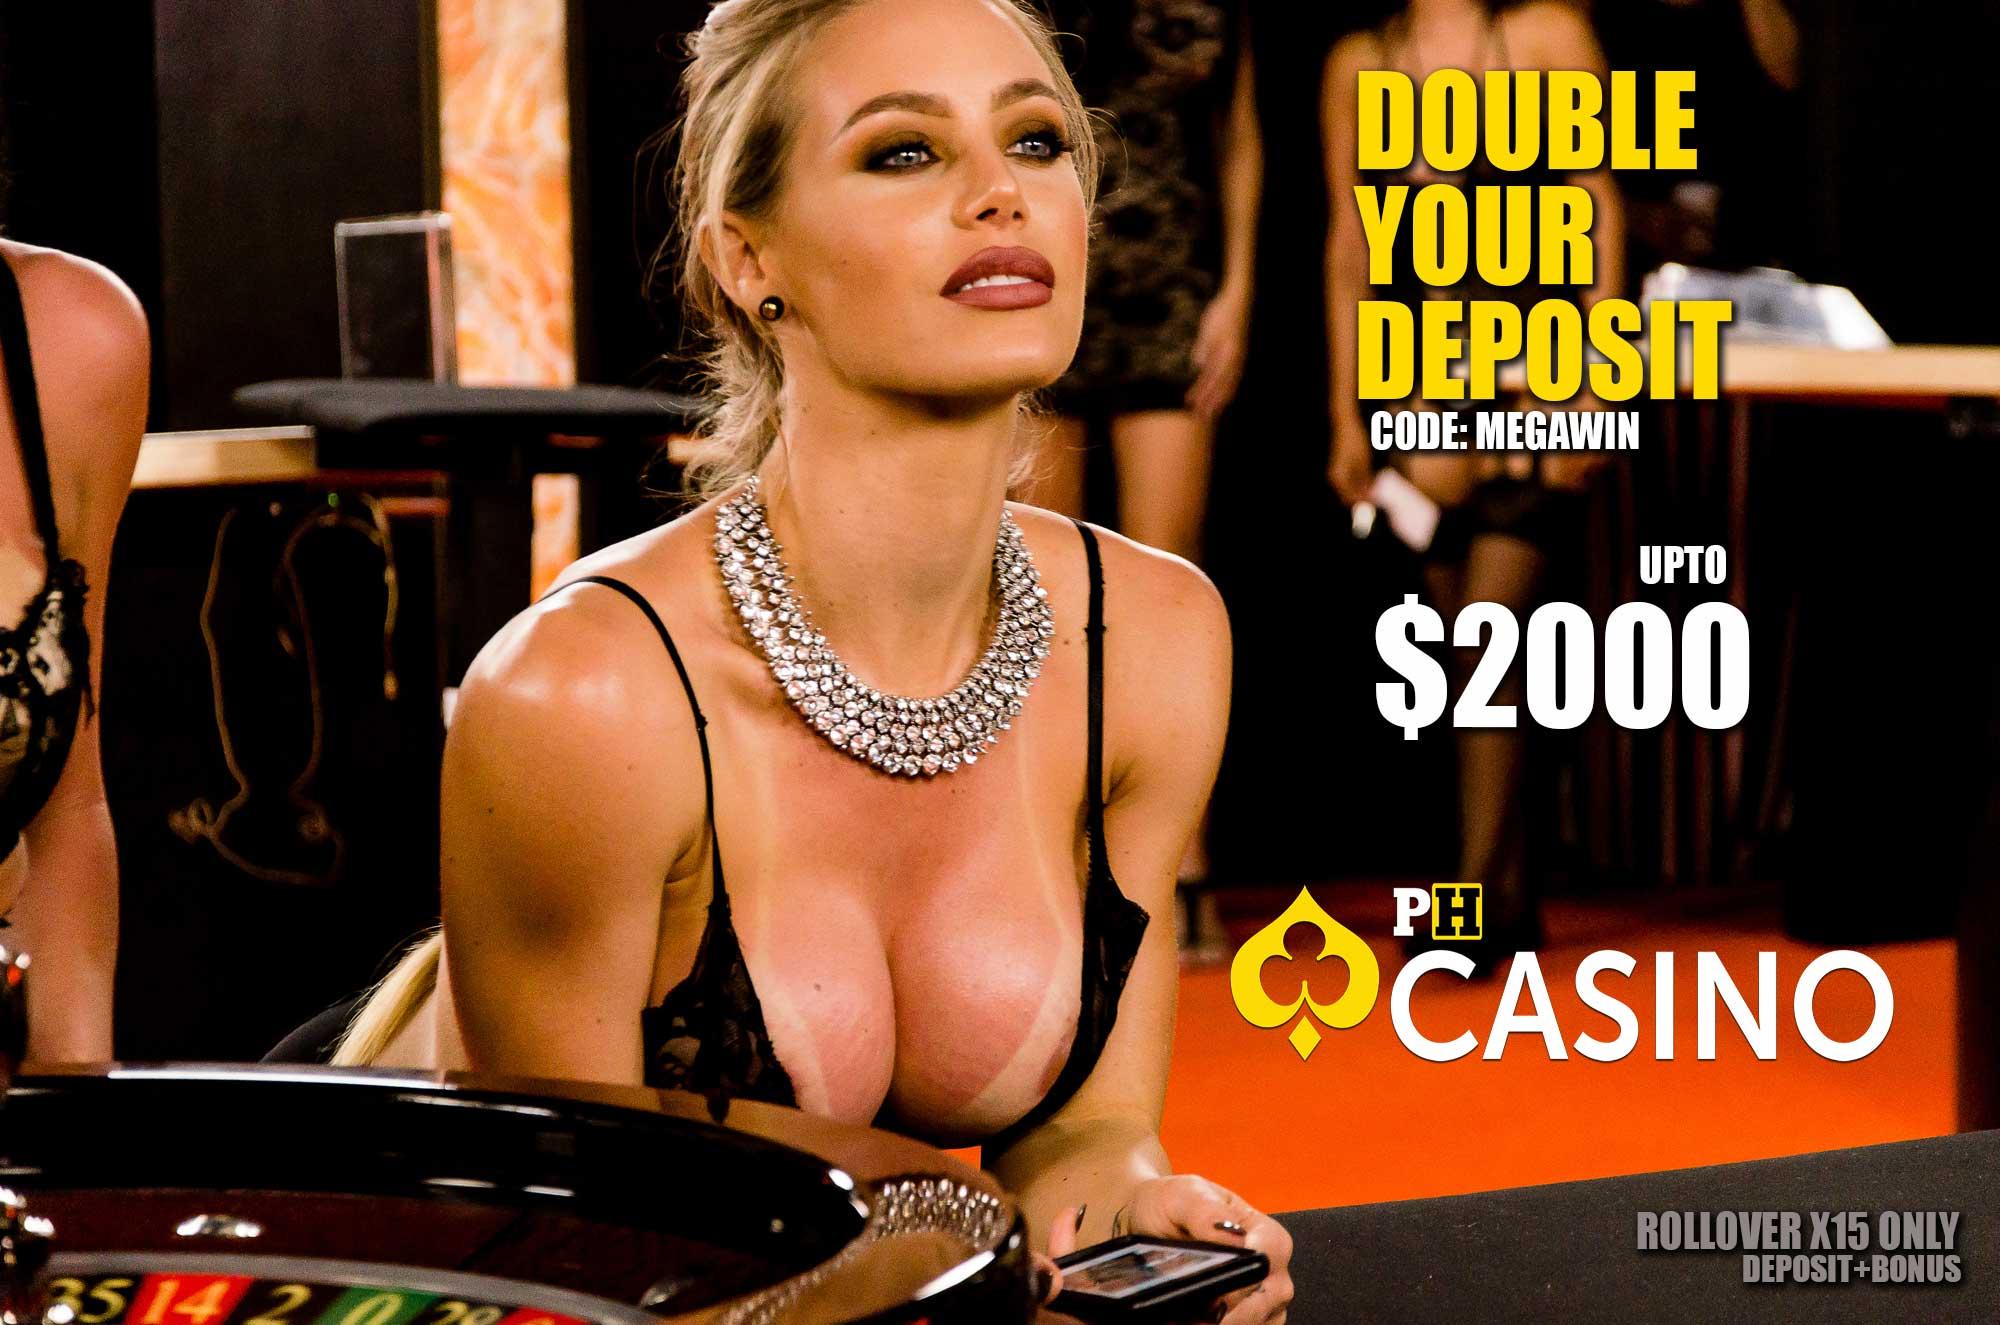 PH Casino Blackjack Queen of Hearts Promo